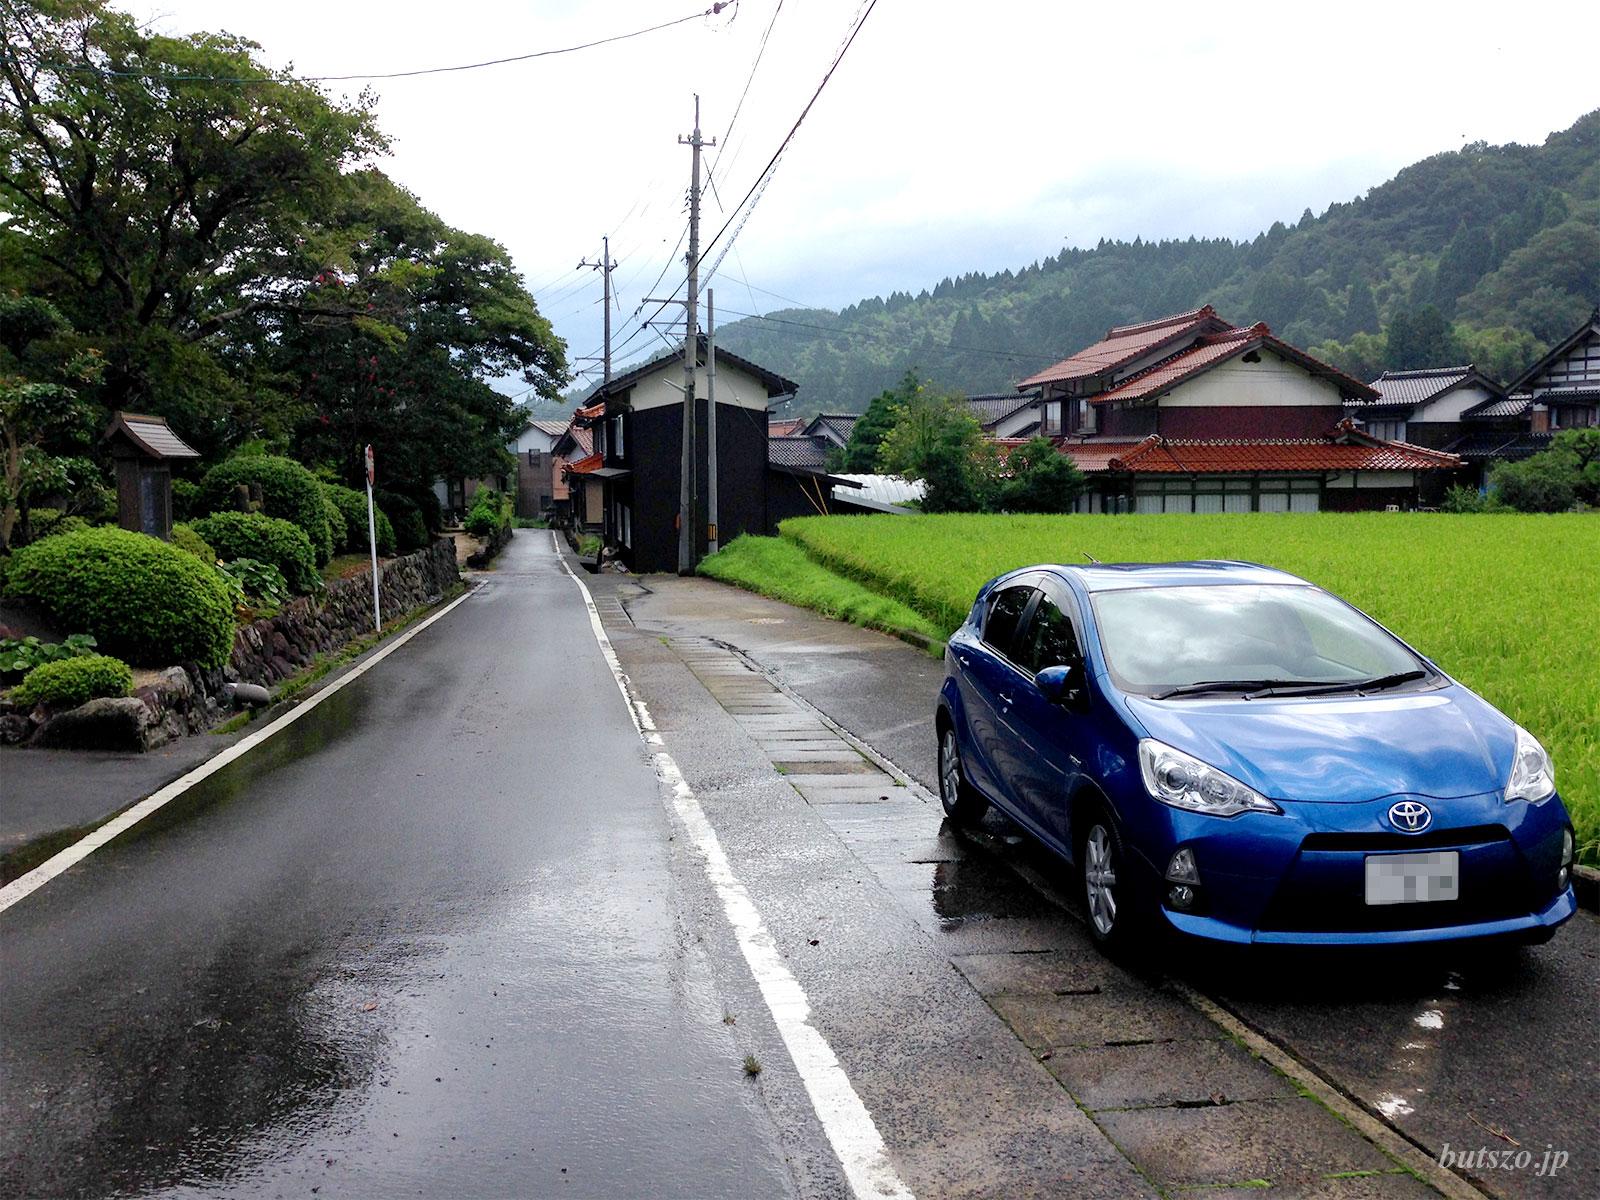 大日寺門前の駐車場